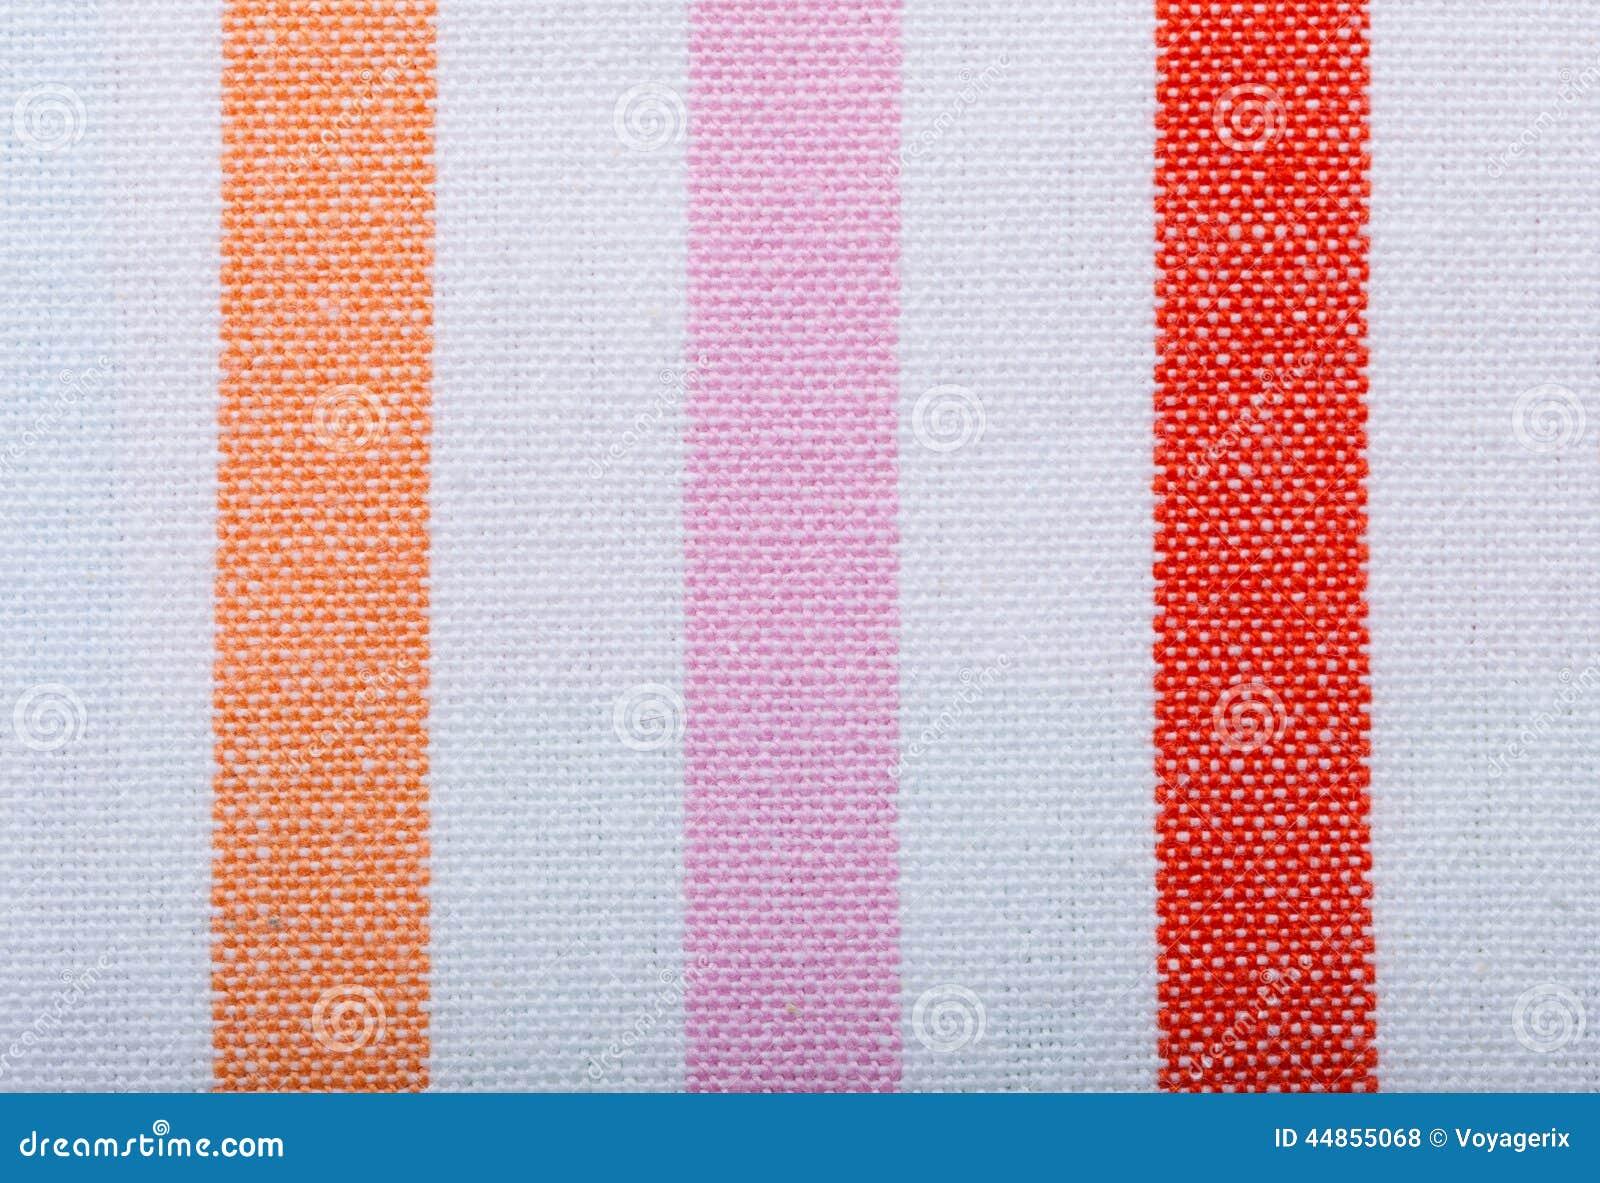 Download Primer De La Materia Textil Rayada Colorida Como Fondo O Textura Foto de archivo - Imagen de diseño, moderno: 44855068